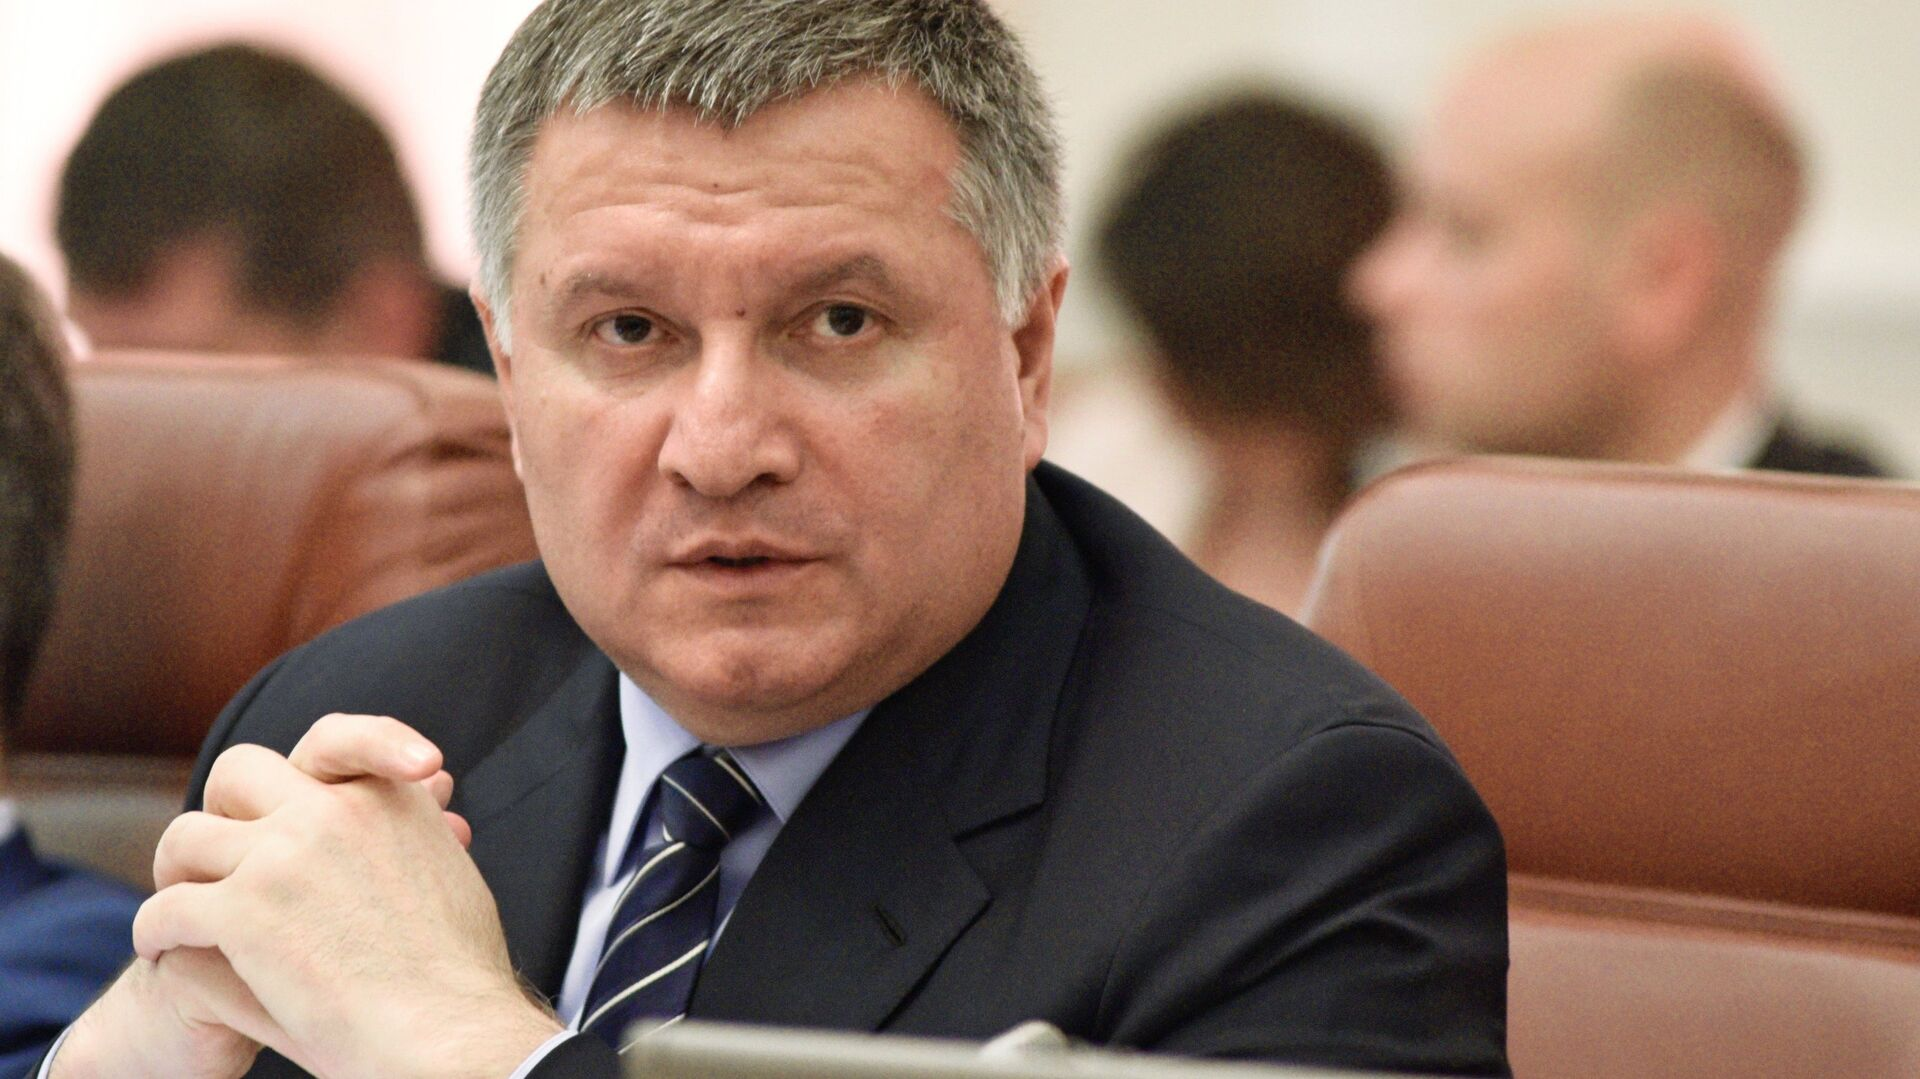 Arsén Avákov en la sesión del Gabinete de Ministros en Kiev - Sputnik Mundo, 1920, 13.07.2021